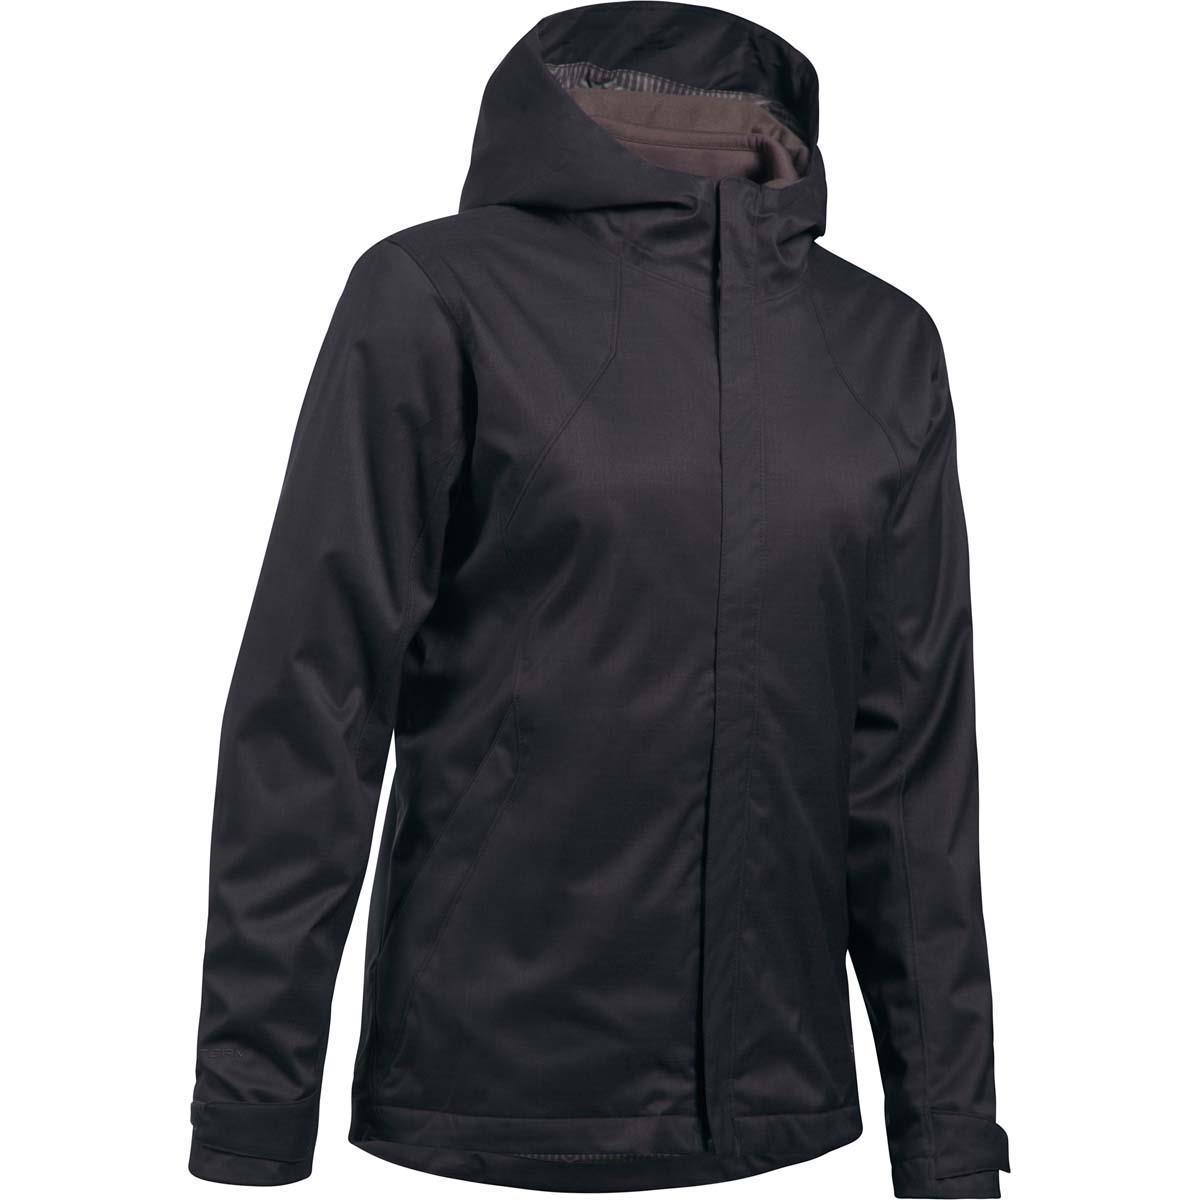 under armour vailer jacket